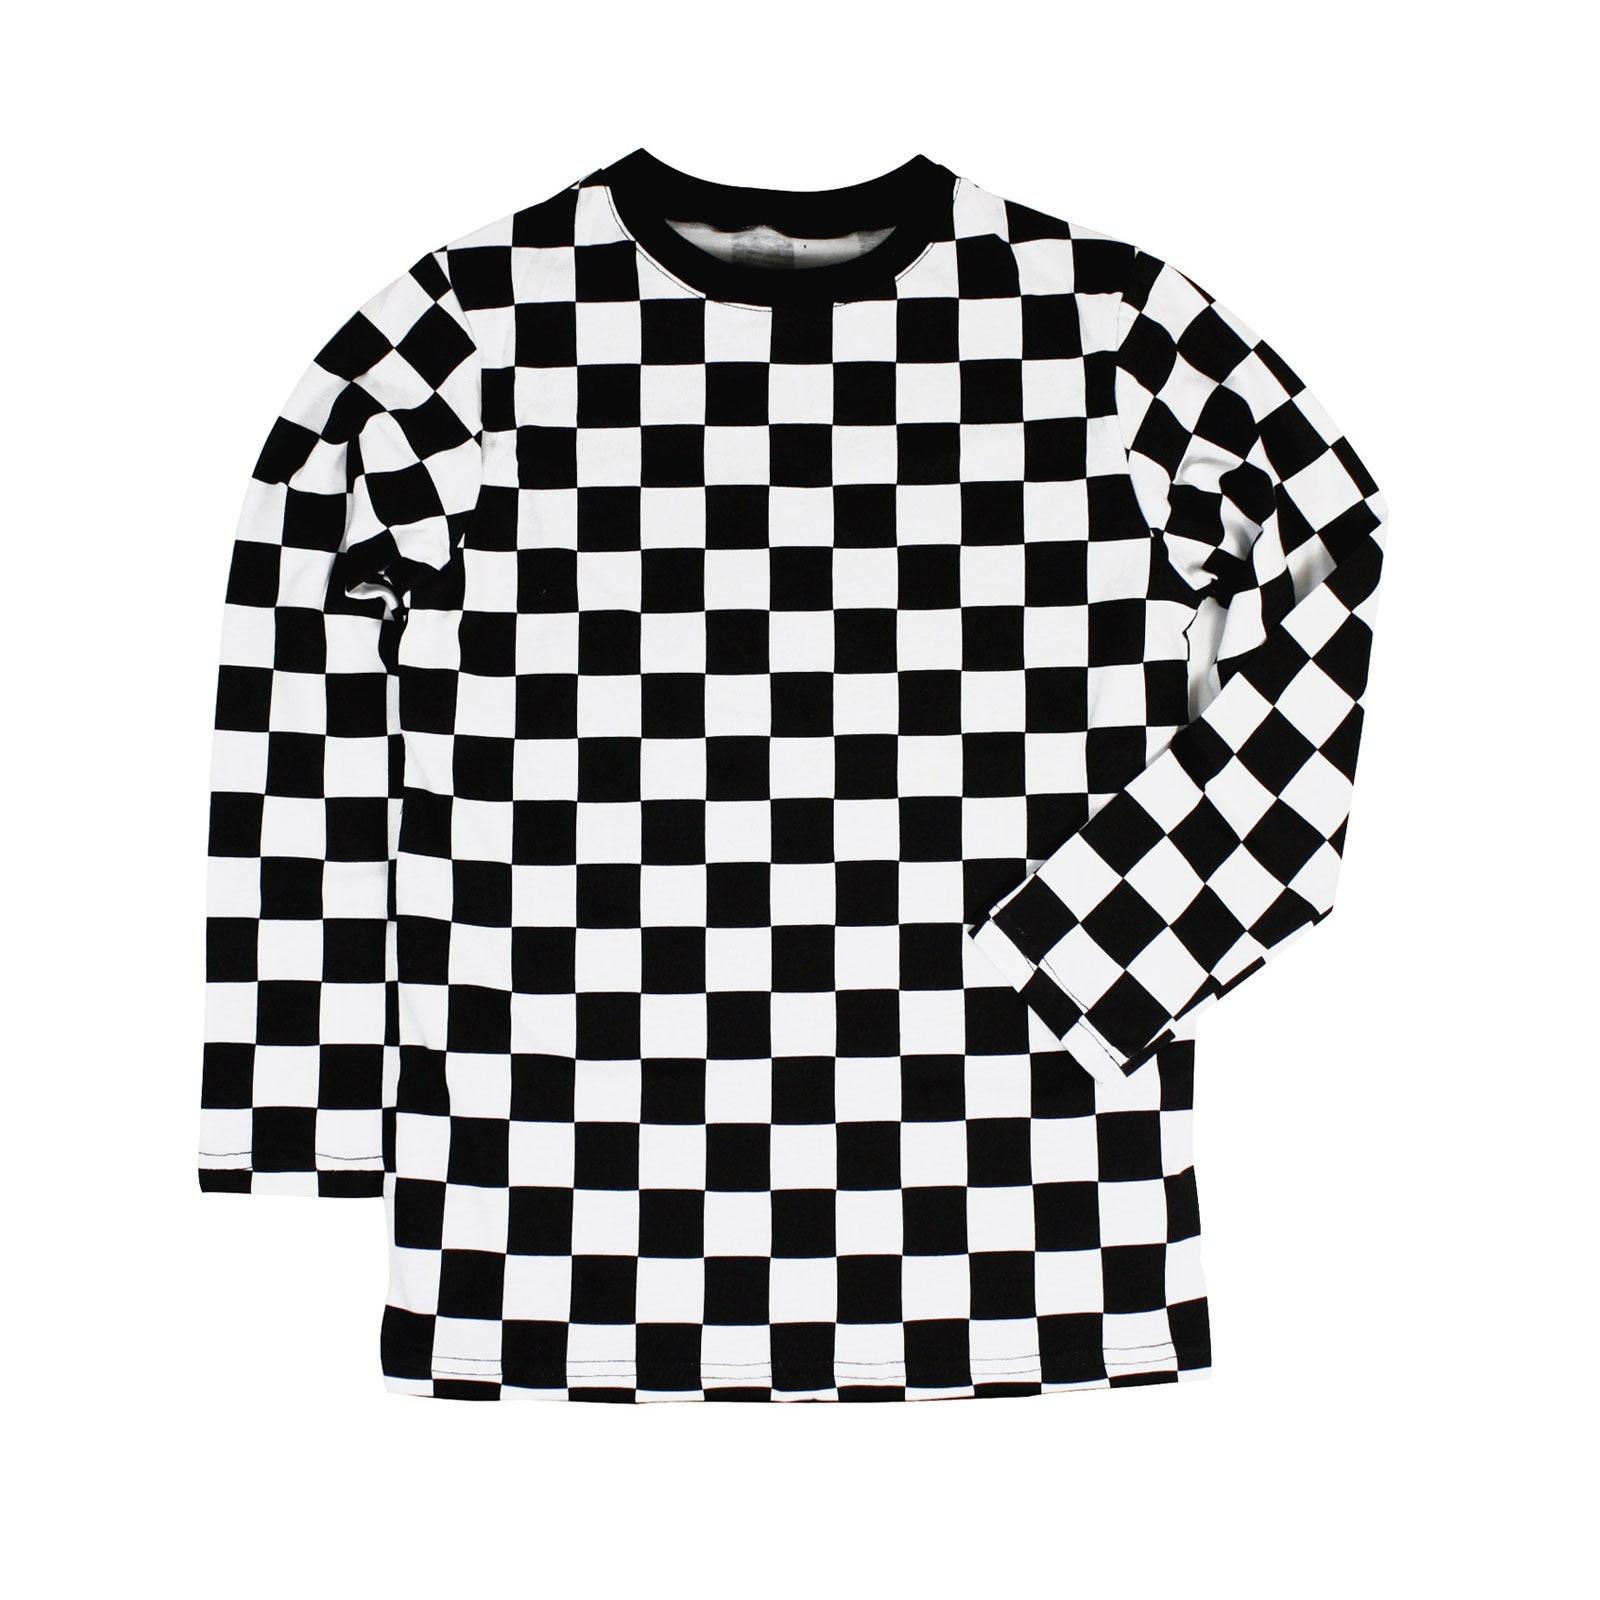 Black And White Checkered Shirts Dreamworks